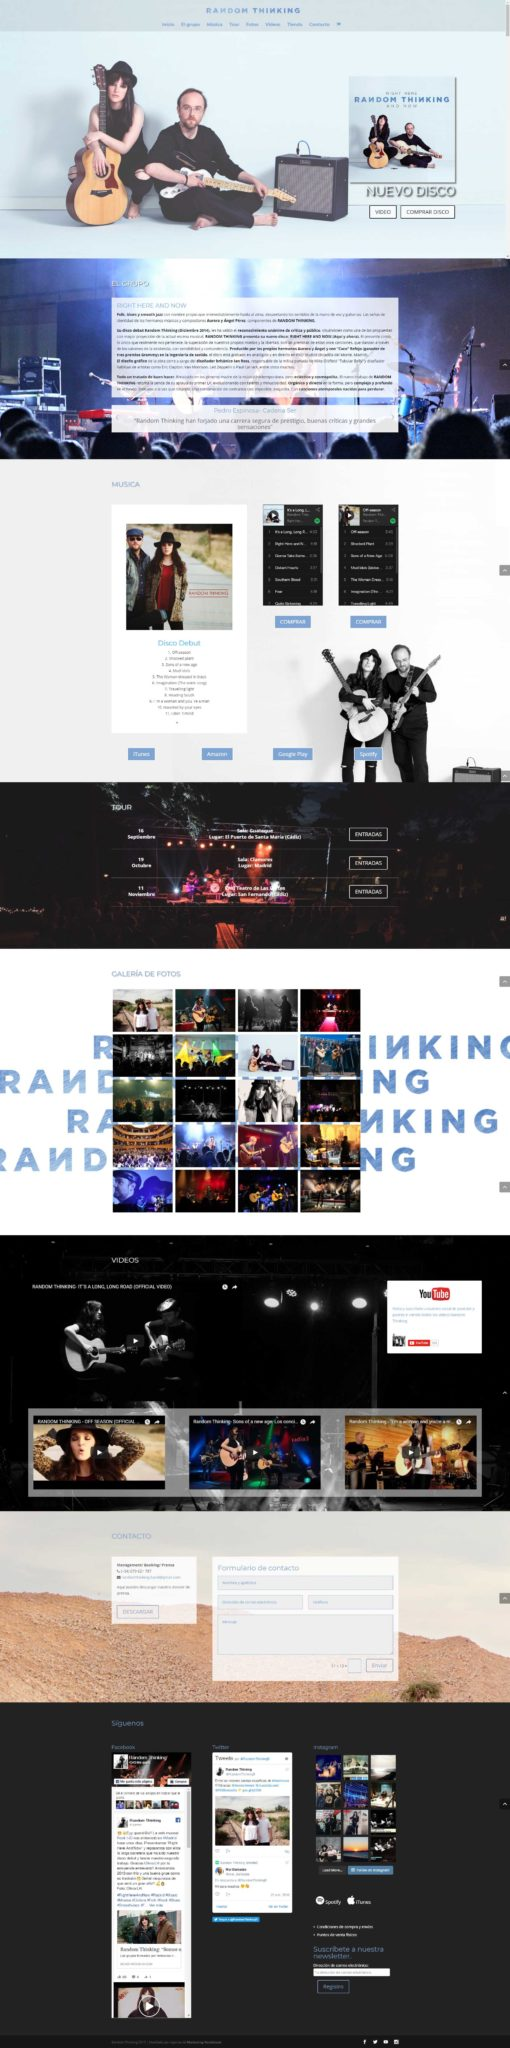 random-thinking proyecto de diseño de neoattack